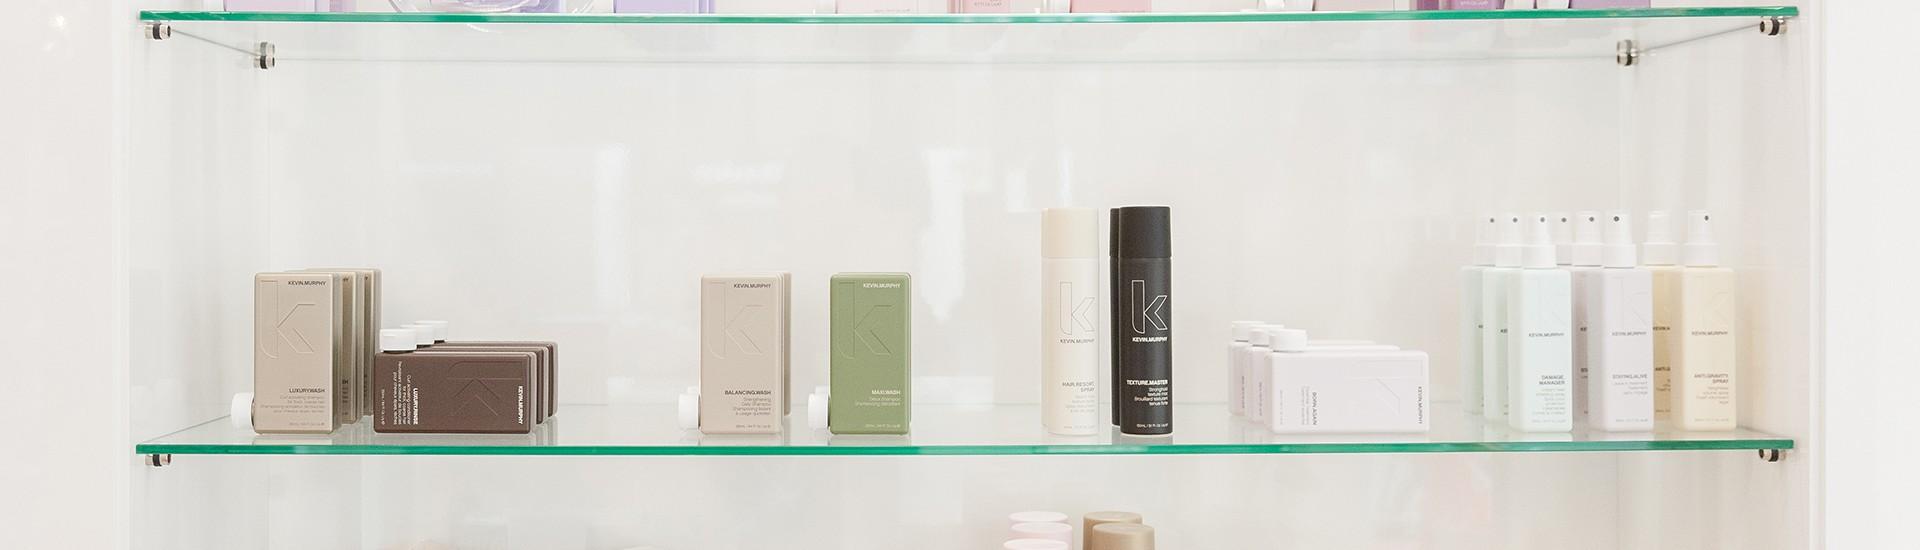 Kbal-hairstylist-Kapsalon-Amsterdam-Kevin-Murphy-products